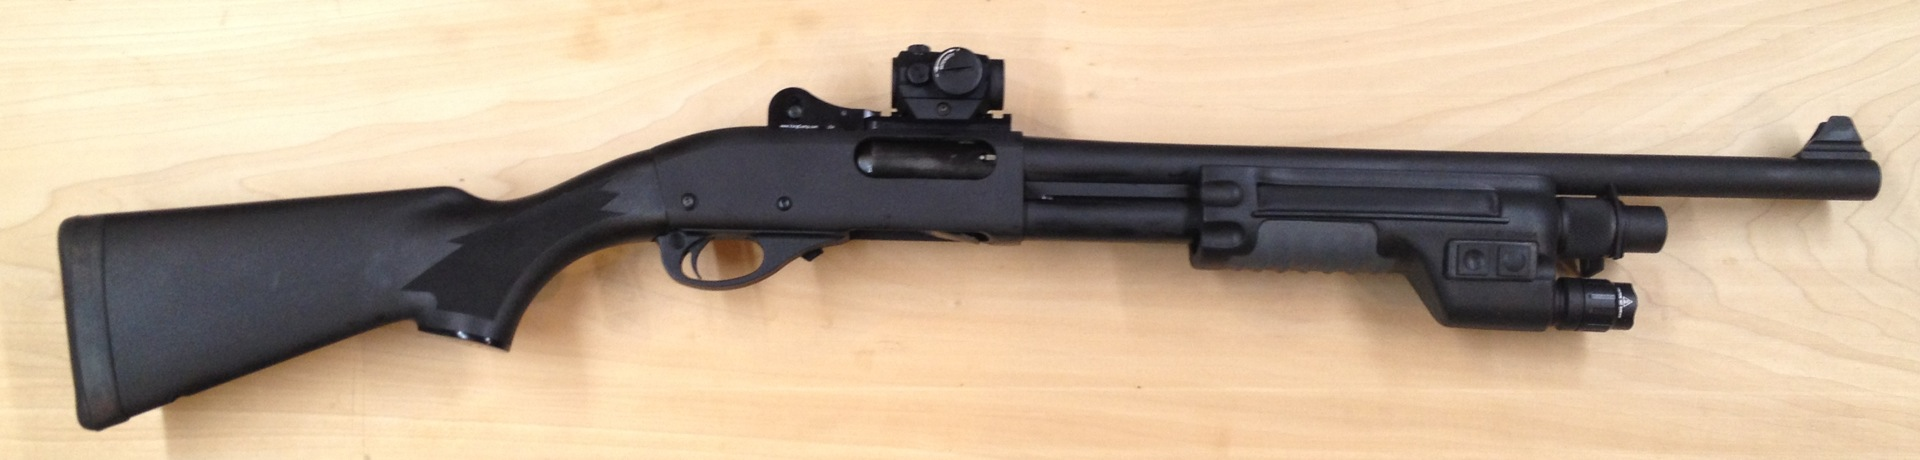 7 Tactical Shotgun Upgrades Rifleshooter Com